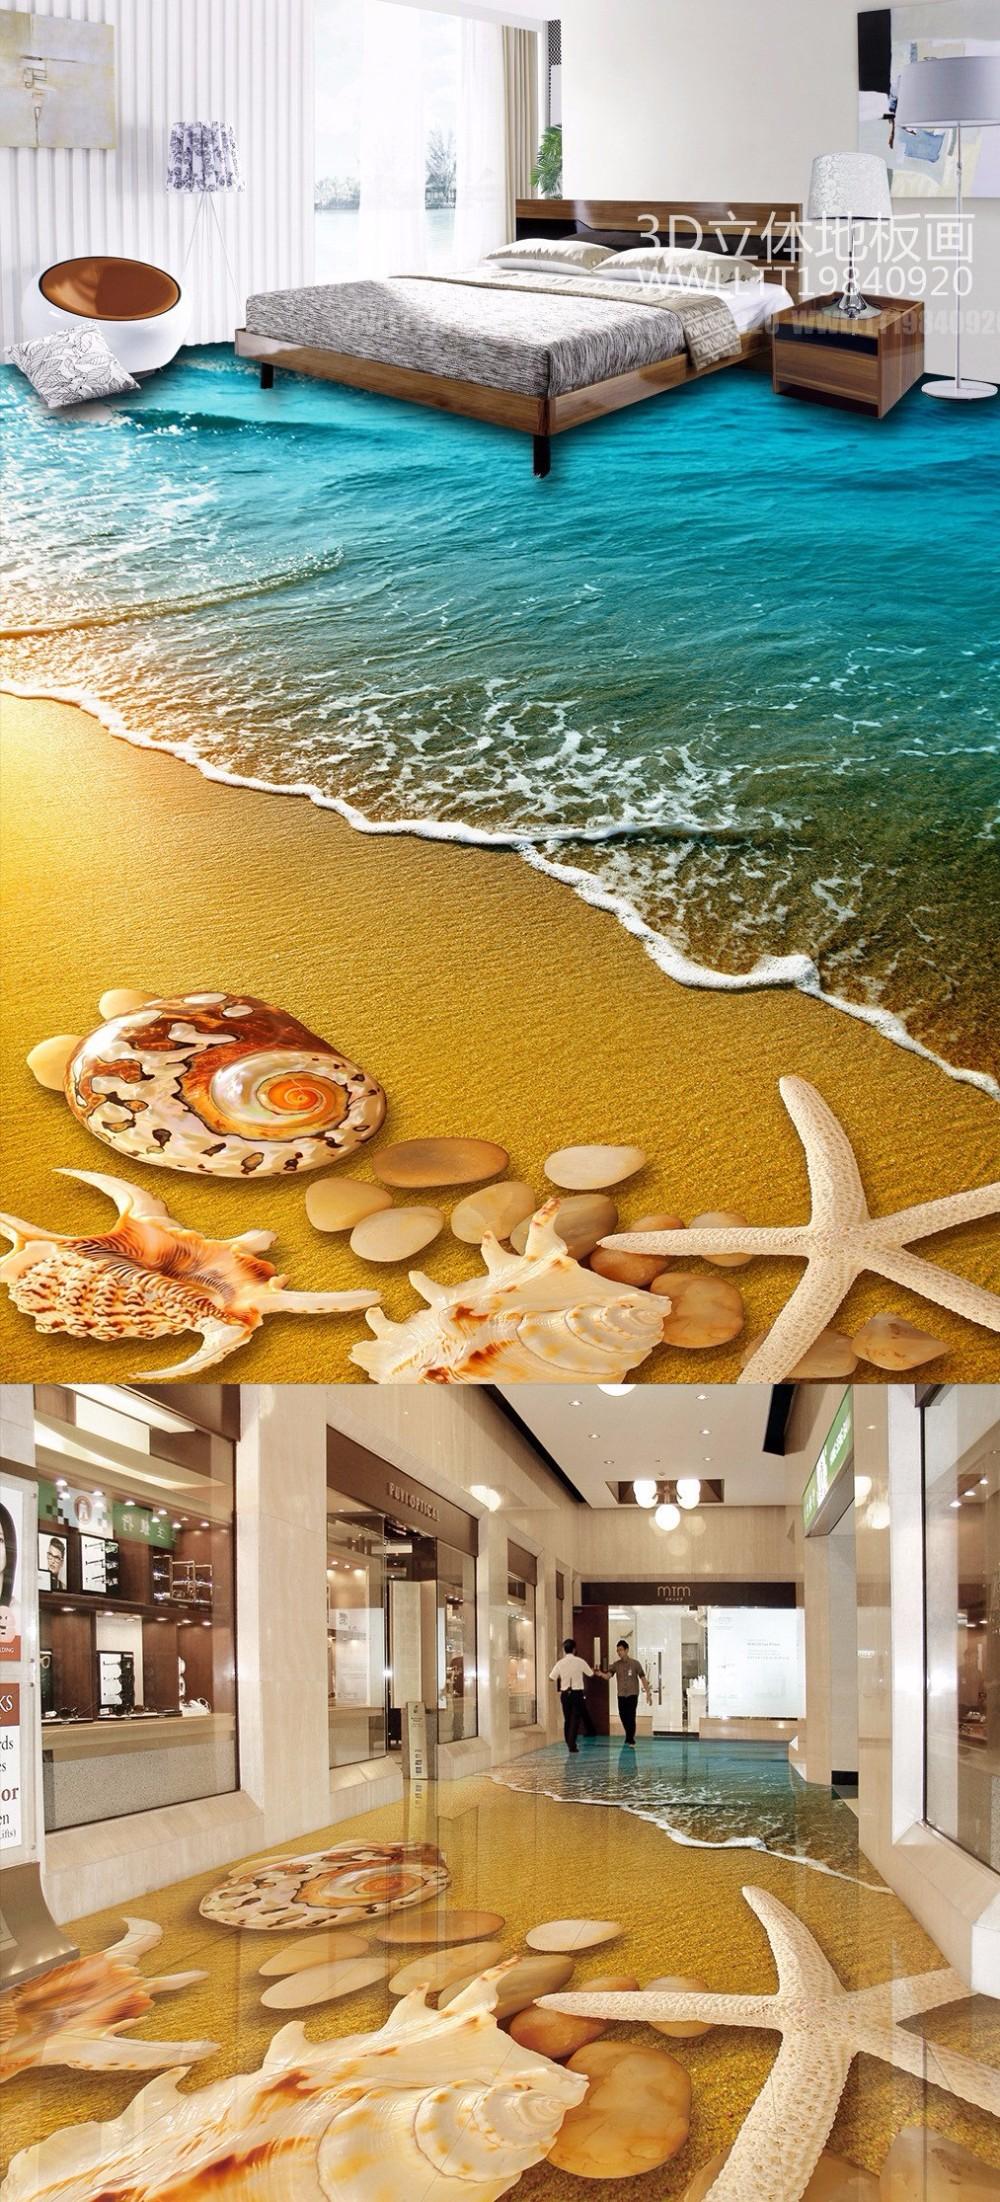 Free Shipping 3D Beach Shell floor painting kitchen living room restaurant  hallway decoration wear PVC floor wallpaper mural - us400 f5dfe151801f